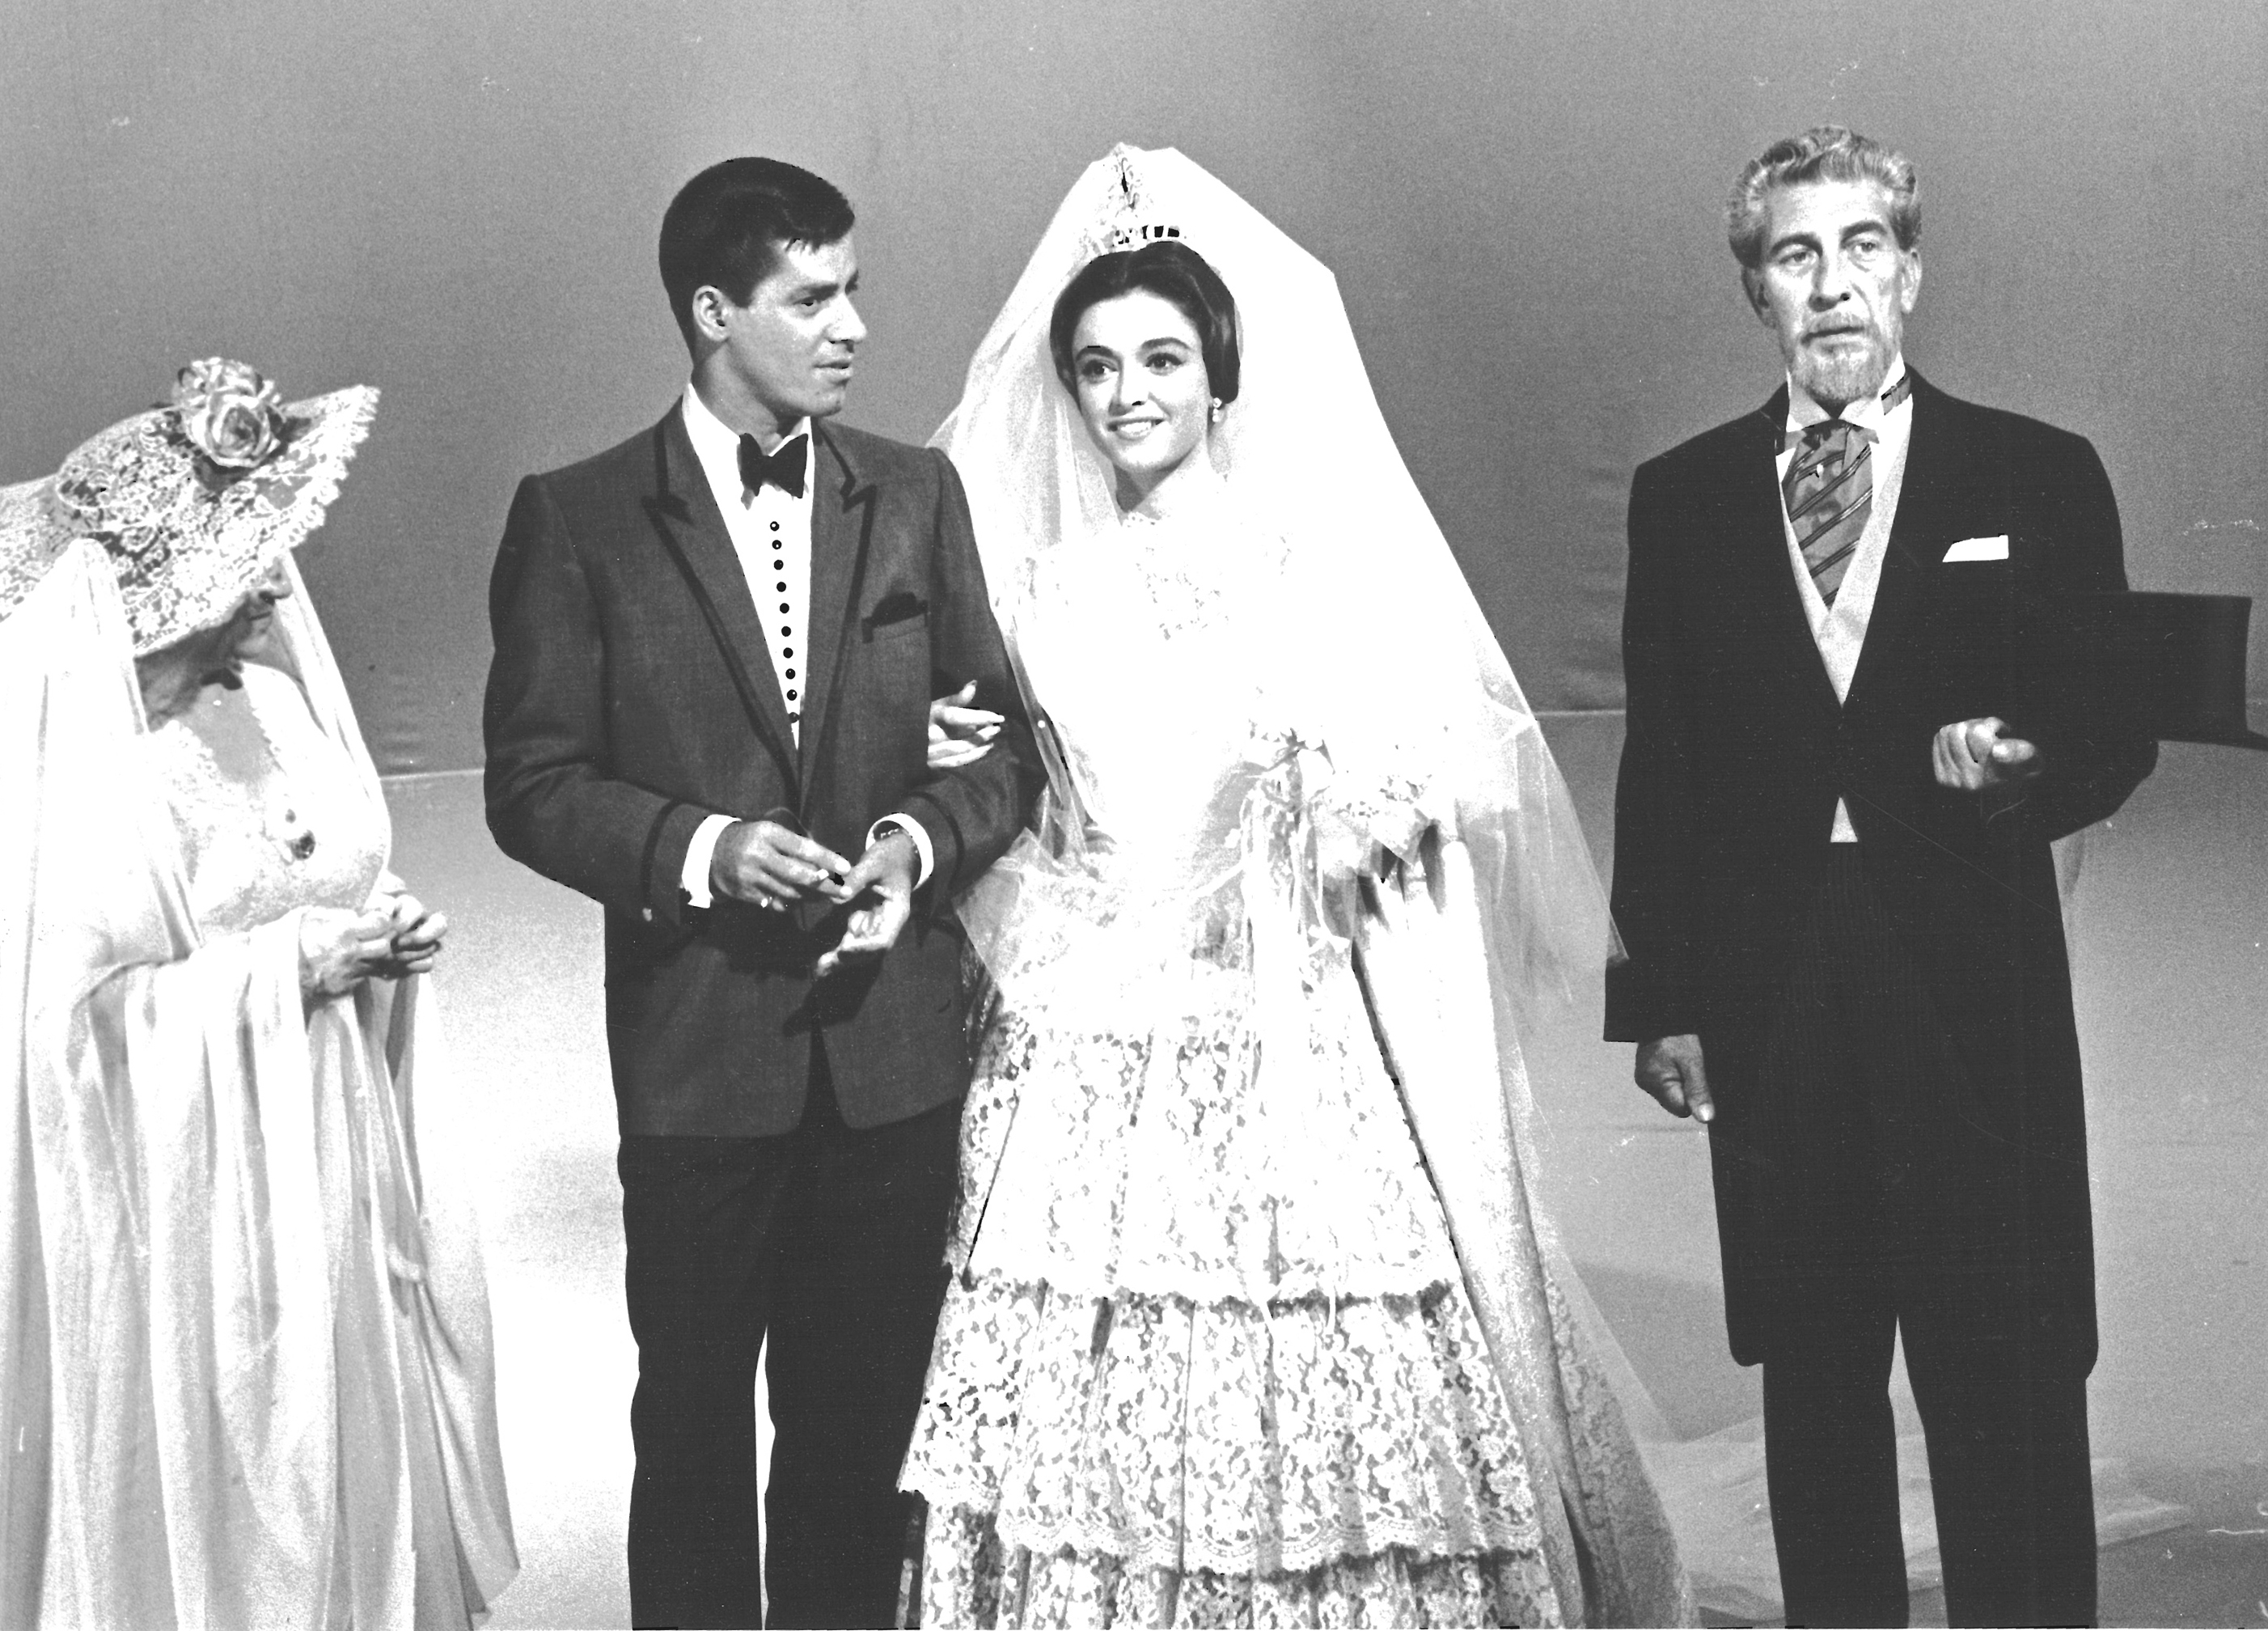 Jerry Lewis, Anna Maria Alberghetti, Eduard Franz, and Molly Picon in Startime (1959)